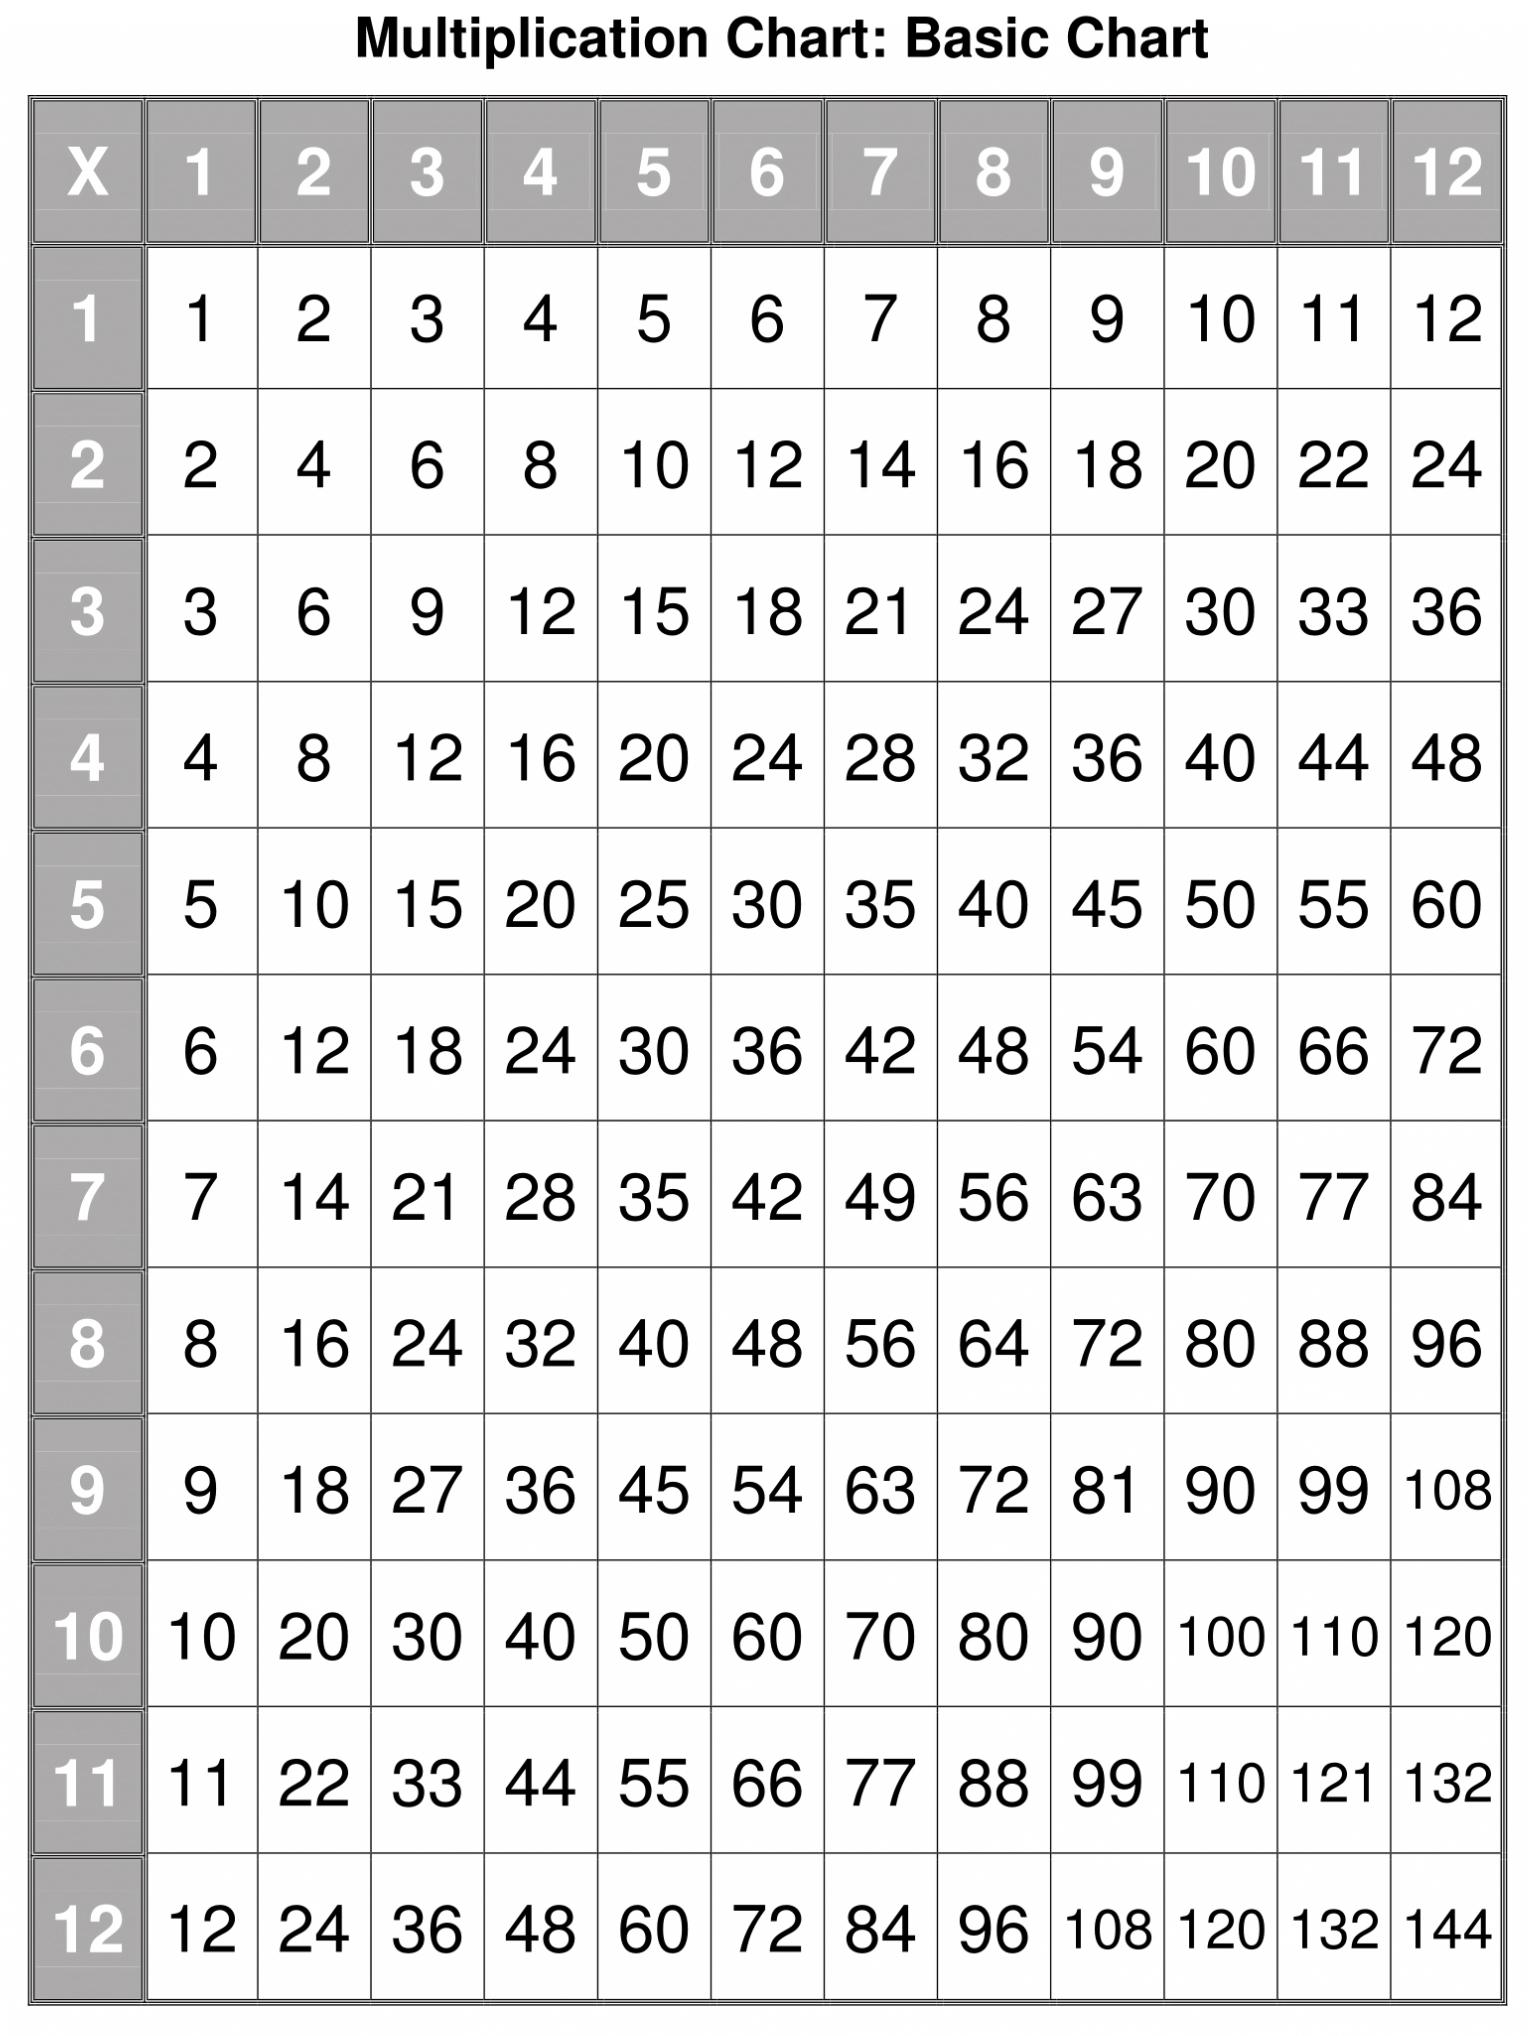 Printable Multiplication Table Pdf | Multiplication Charts for Printable Pdf Multiplication Chart